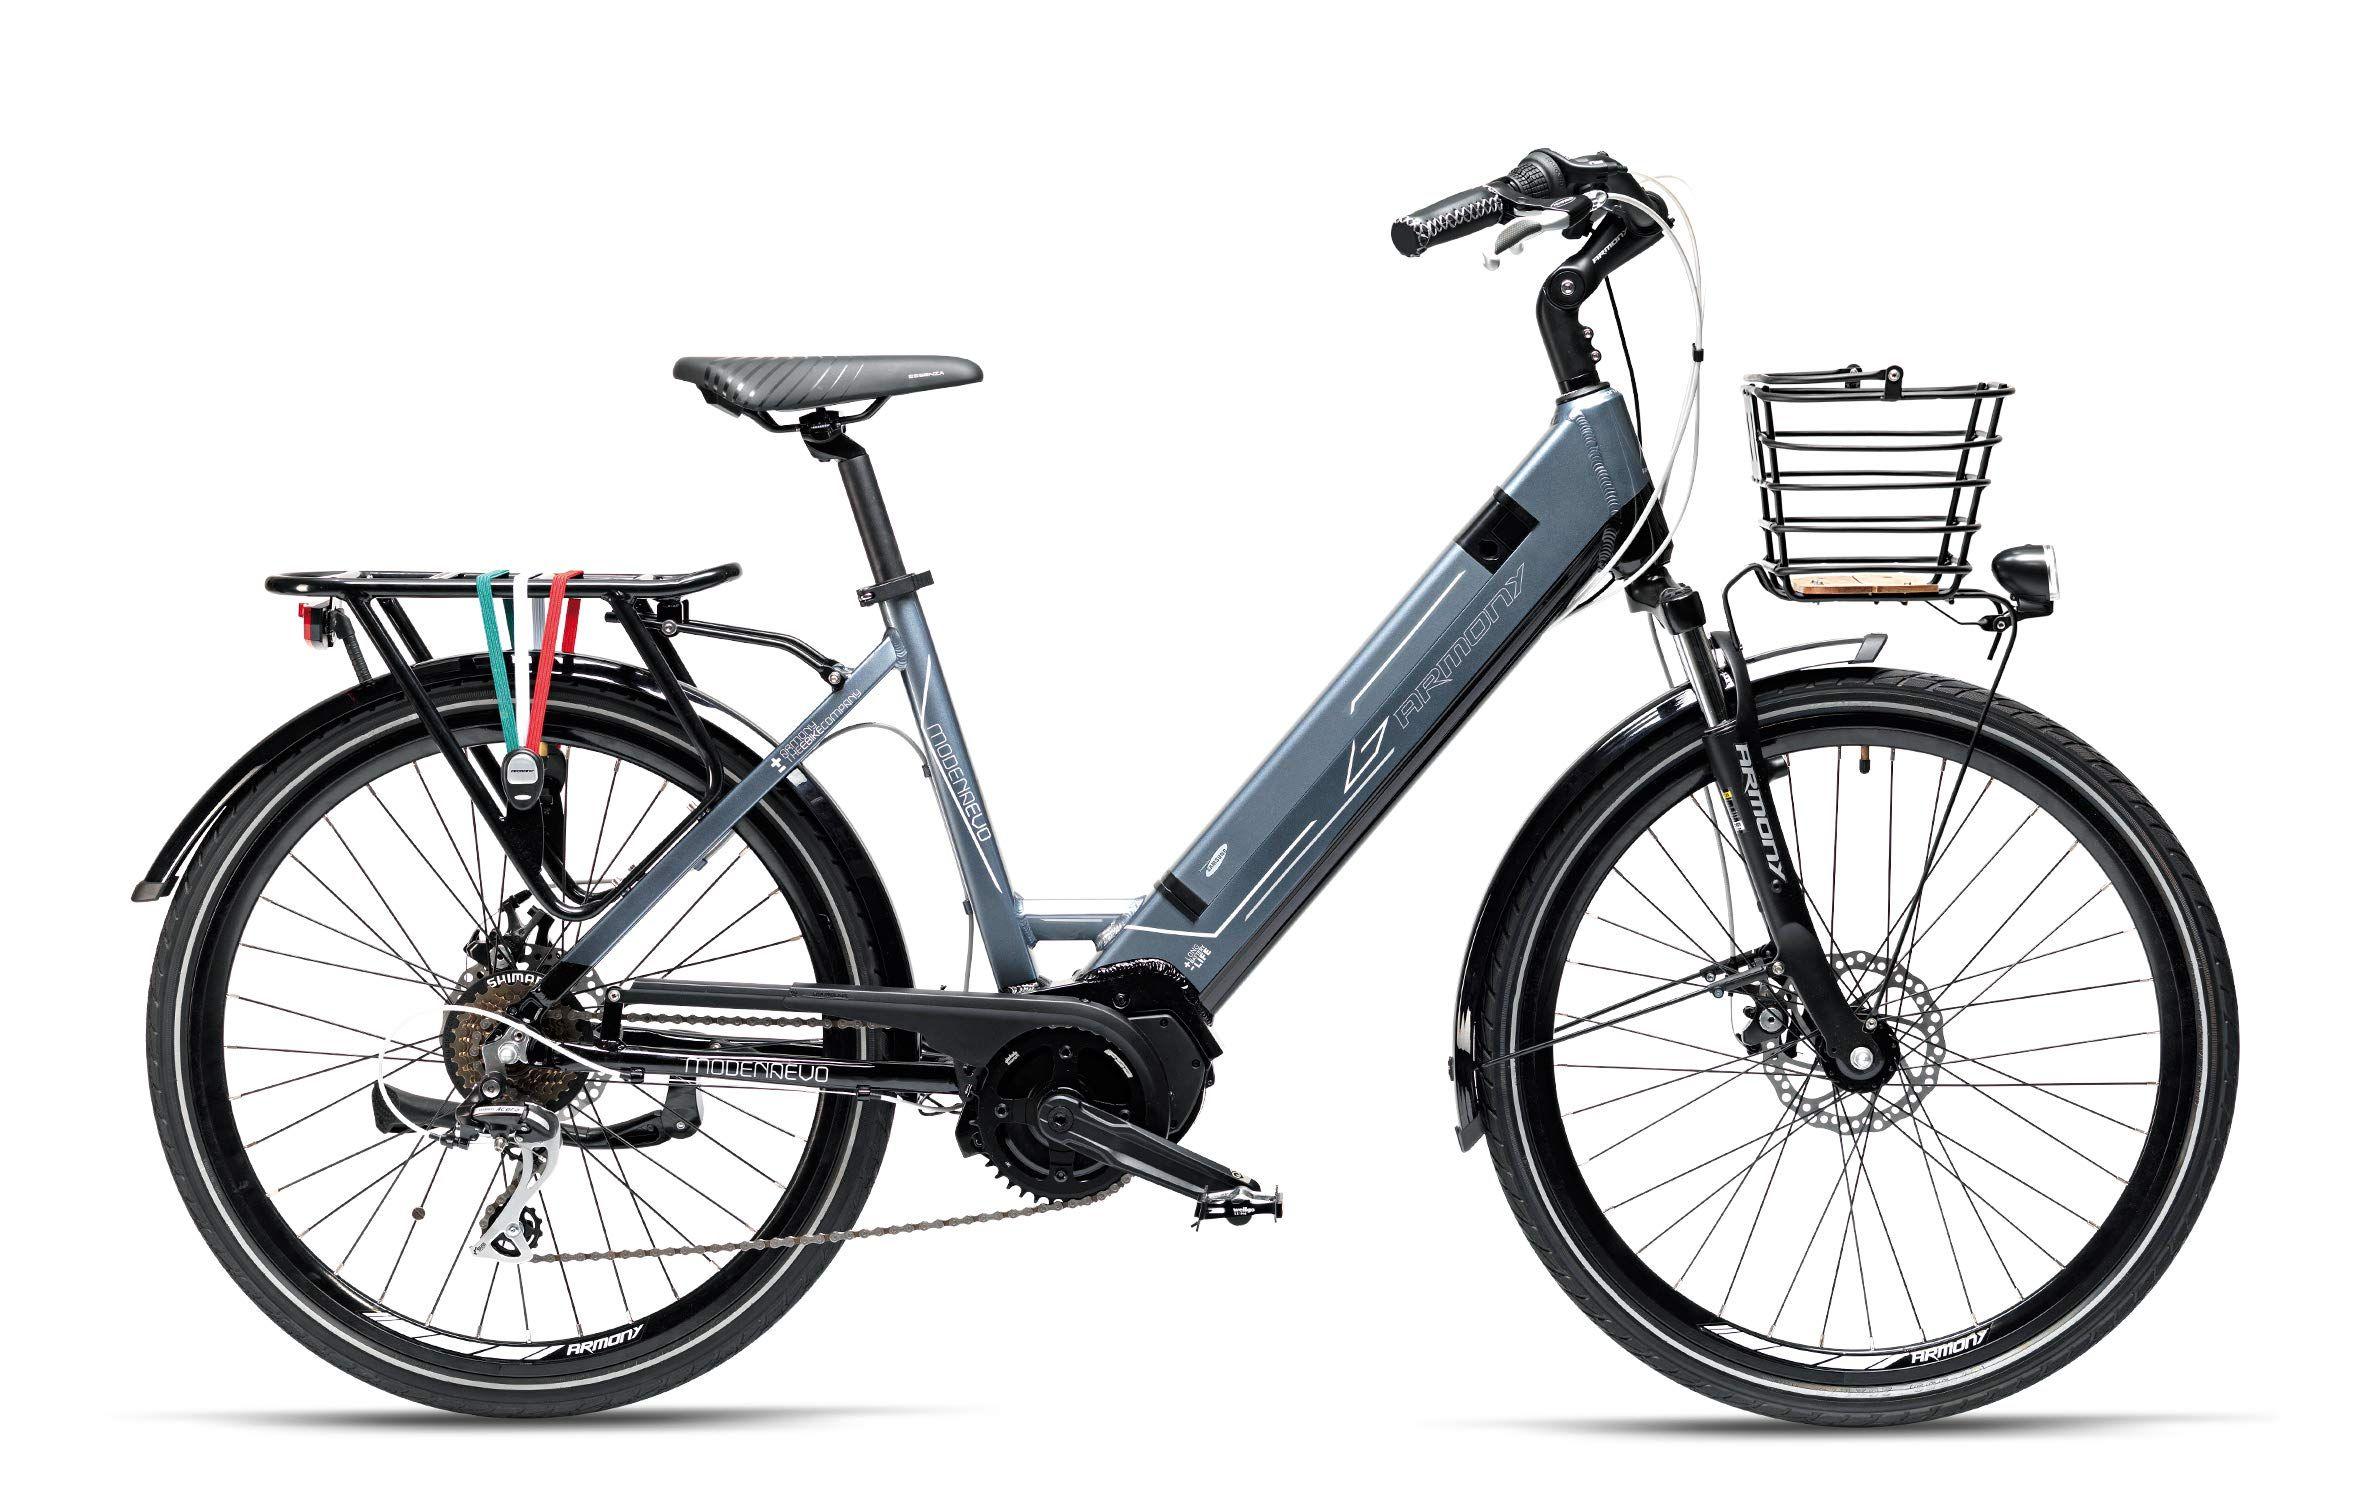 Armony Modena Evo, Bicicletta Elettrica Unisex Adulto